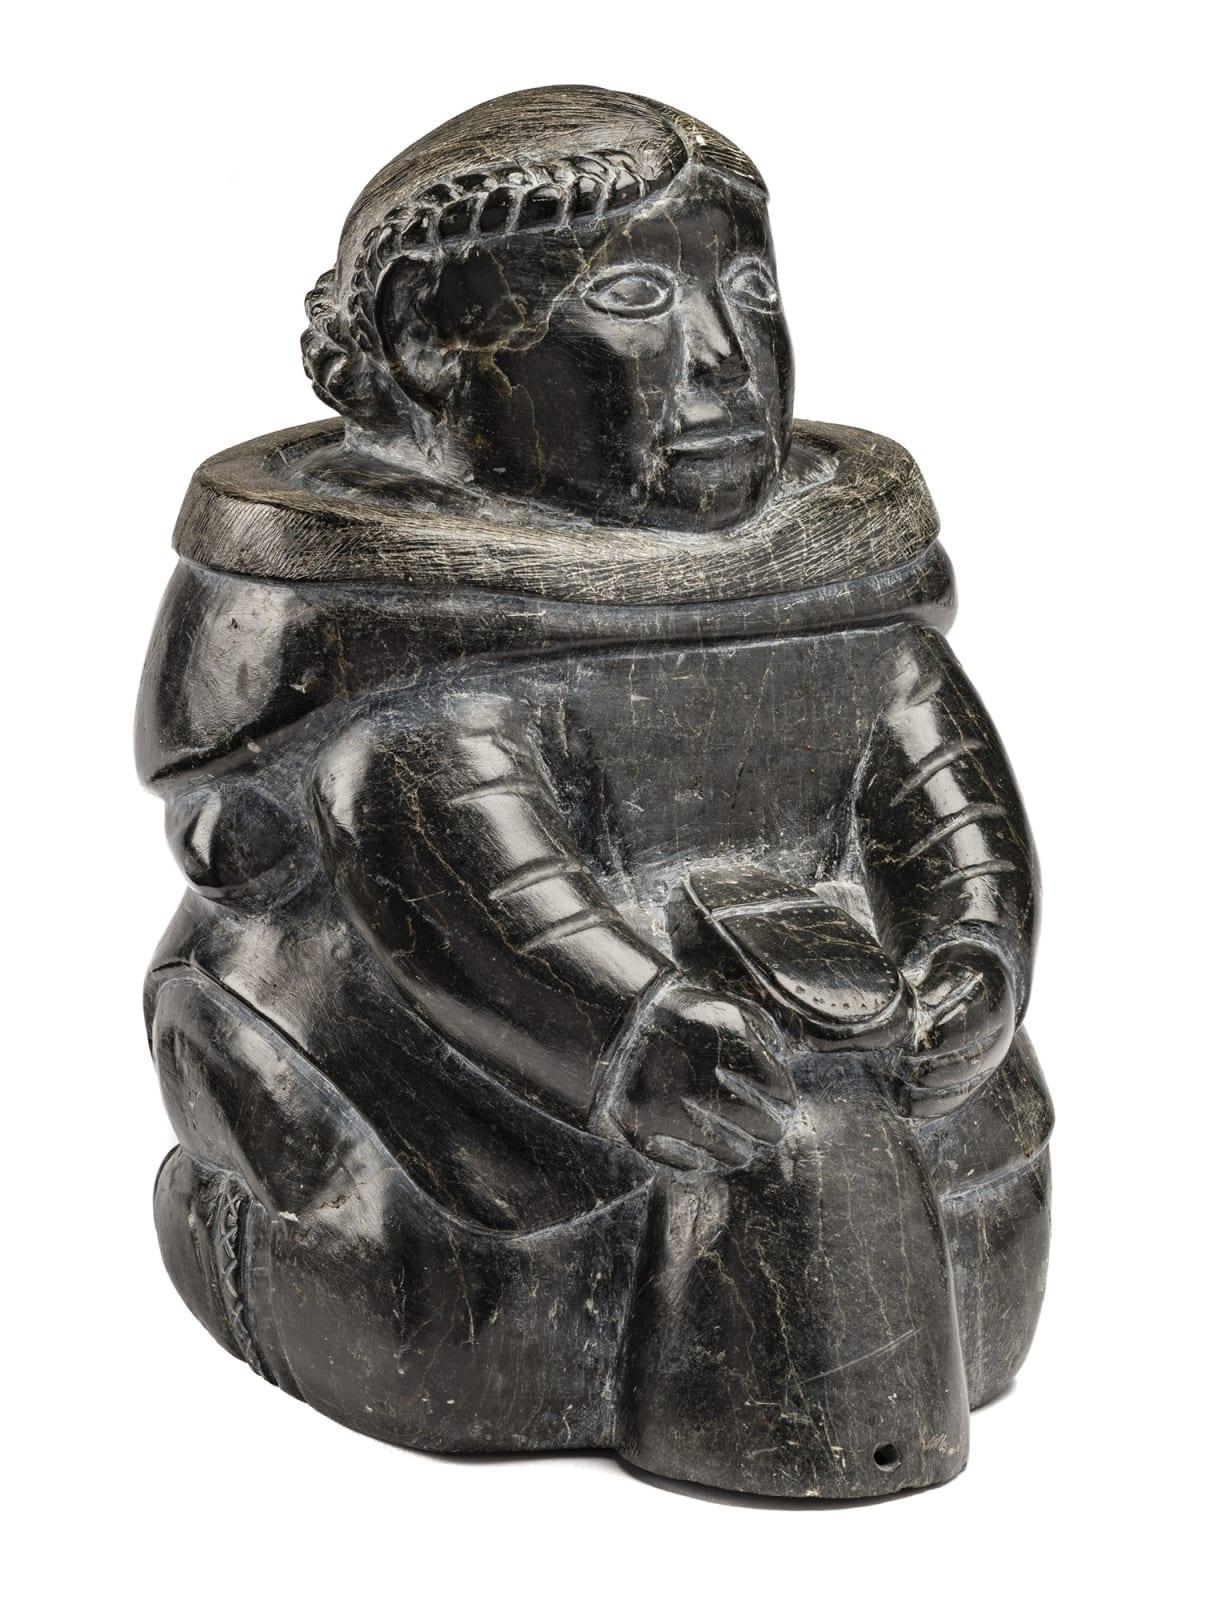 Lot 102 SARAH MEEKO NASTAPOKA (1925-d) INUKJUAK (PORT HARRISON Kneeling Woman Mending A Kamik, c. early 1960s stone, 12.5 x 7.25 x 9.5 in (31.8 x 18.4 x 24.1 cm) Estimate: $6,000— $9,000 price realized: $7,200